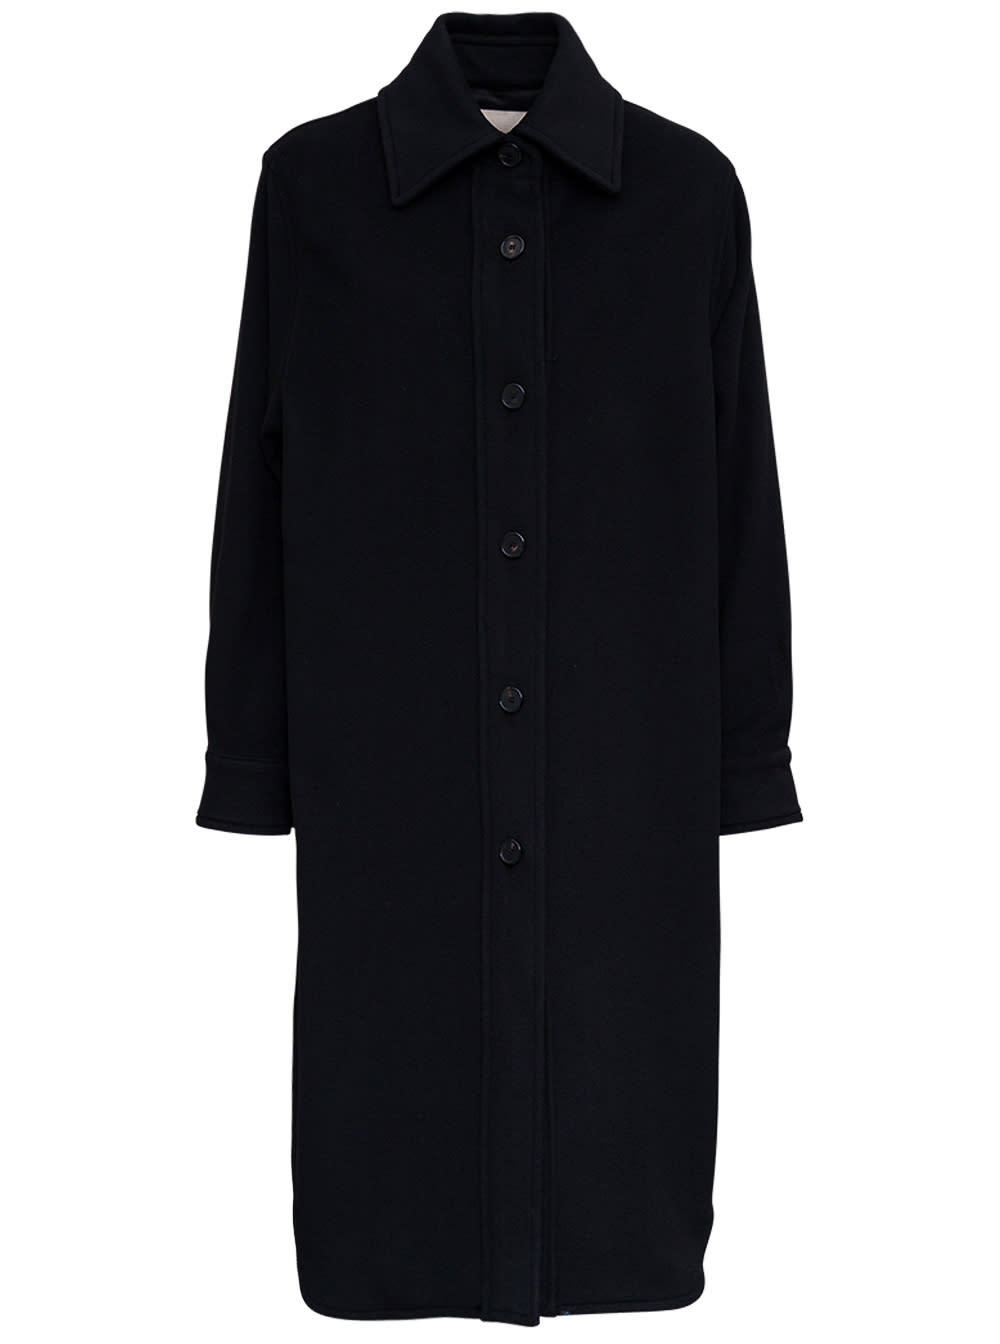 Ssingle-breasted Long Coat In Black Wool Blend